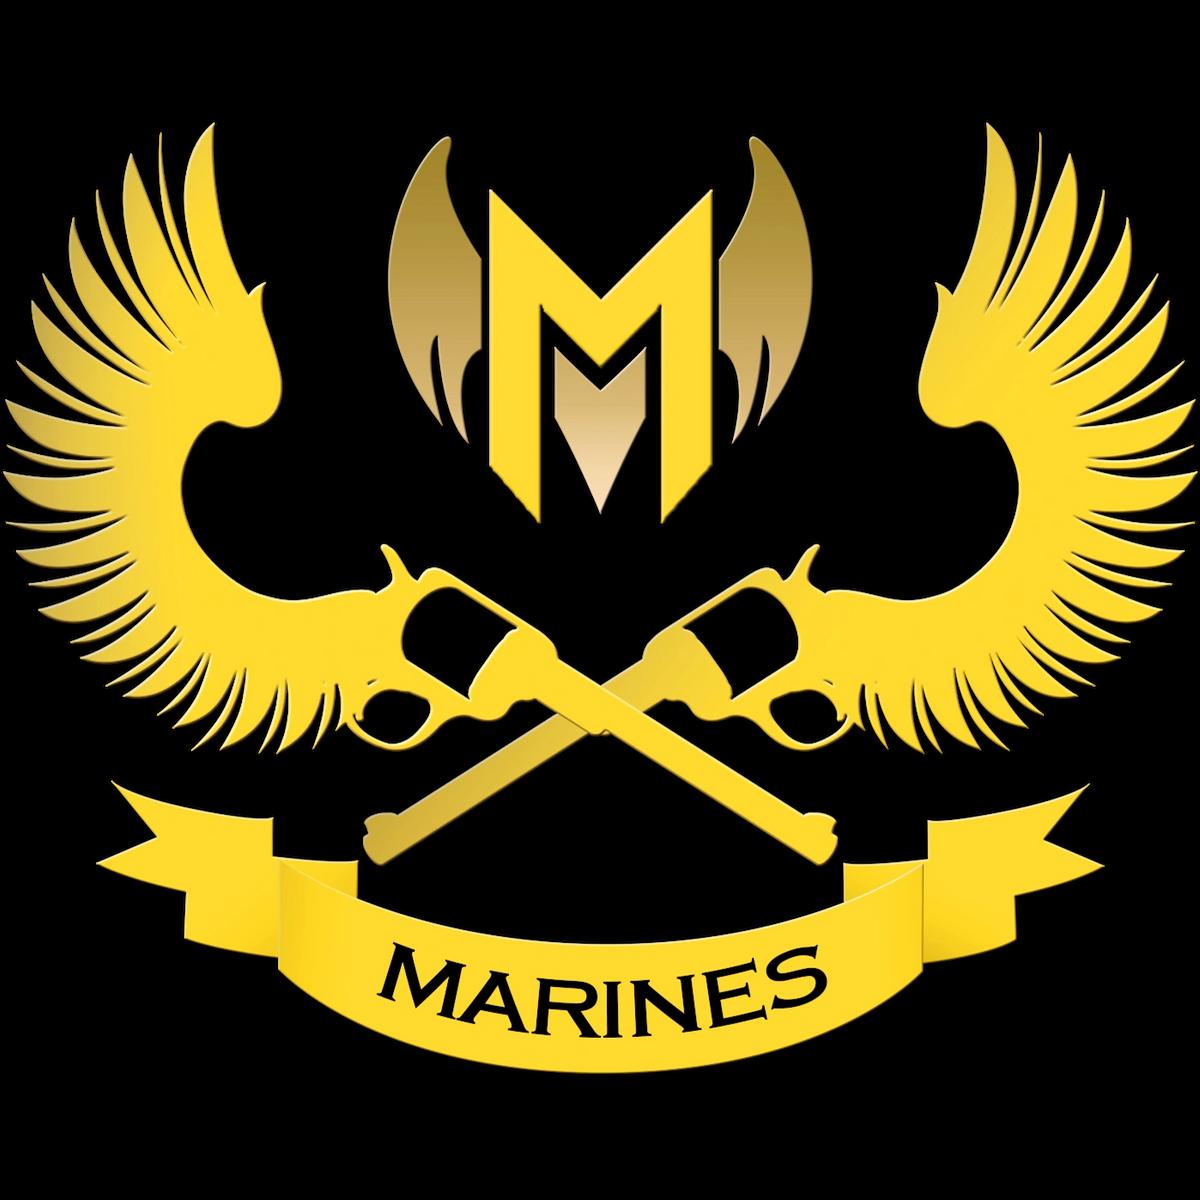 gigabyte marines lol